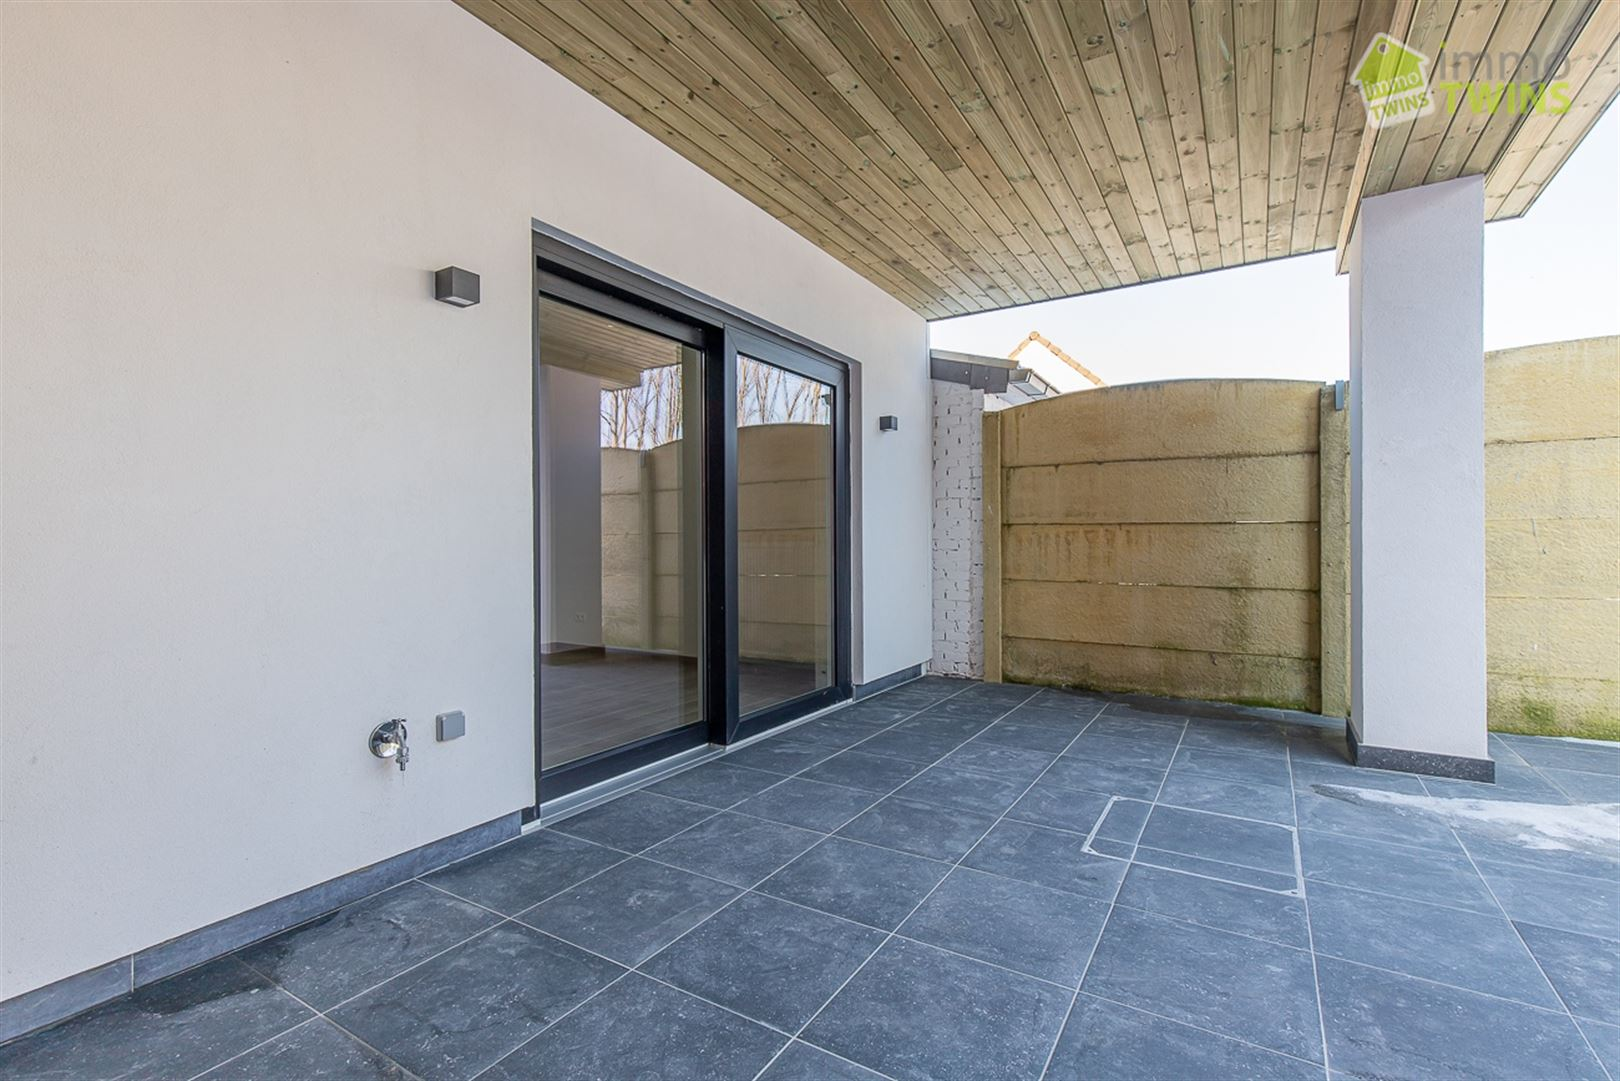 Foto 4 : Huis te 1840 MALDEREN (België) - Prijs € 375.000